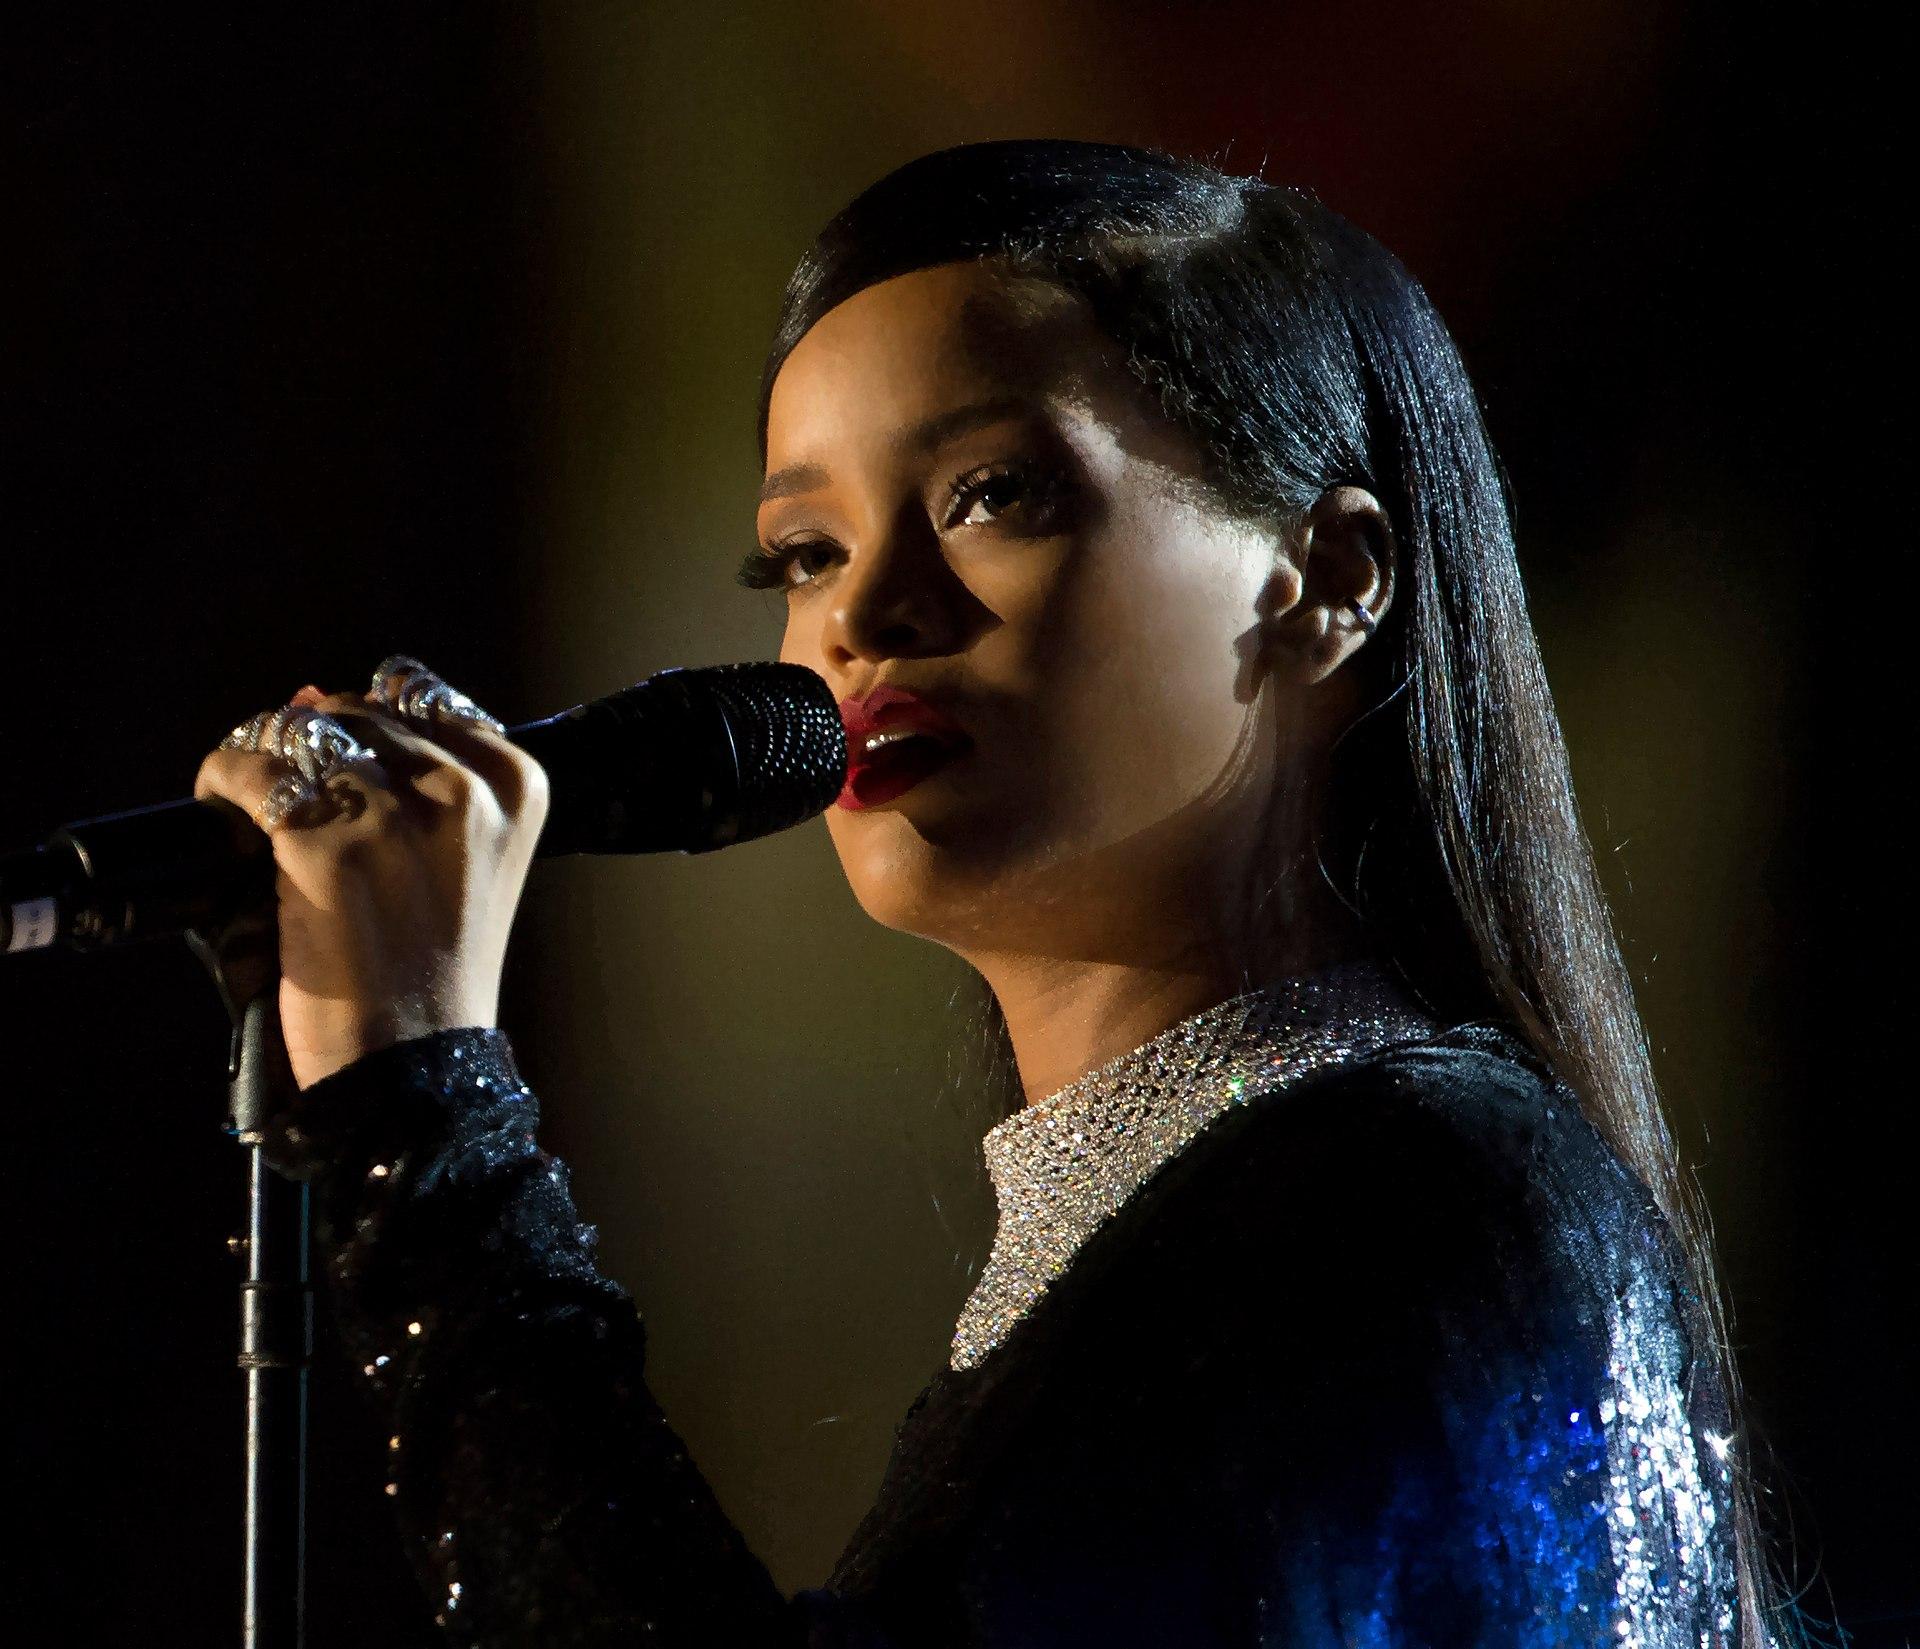 Rihanna - Wikipedia Rihanna